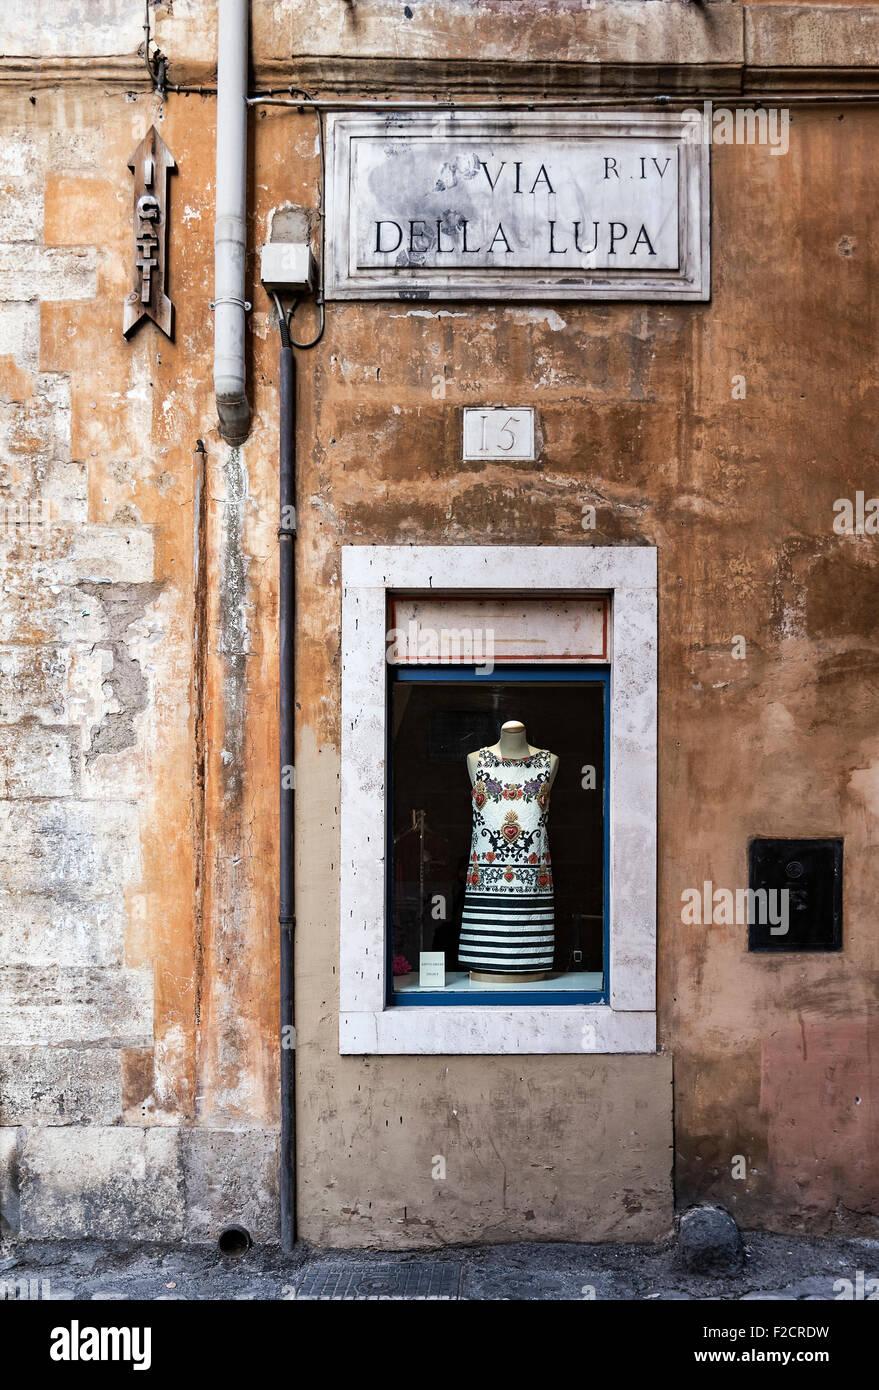 Dress shop window display on old street, Rome, Italy - Stock Image